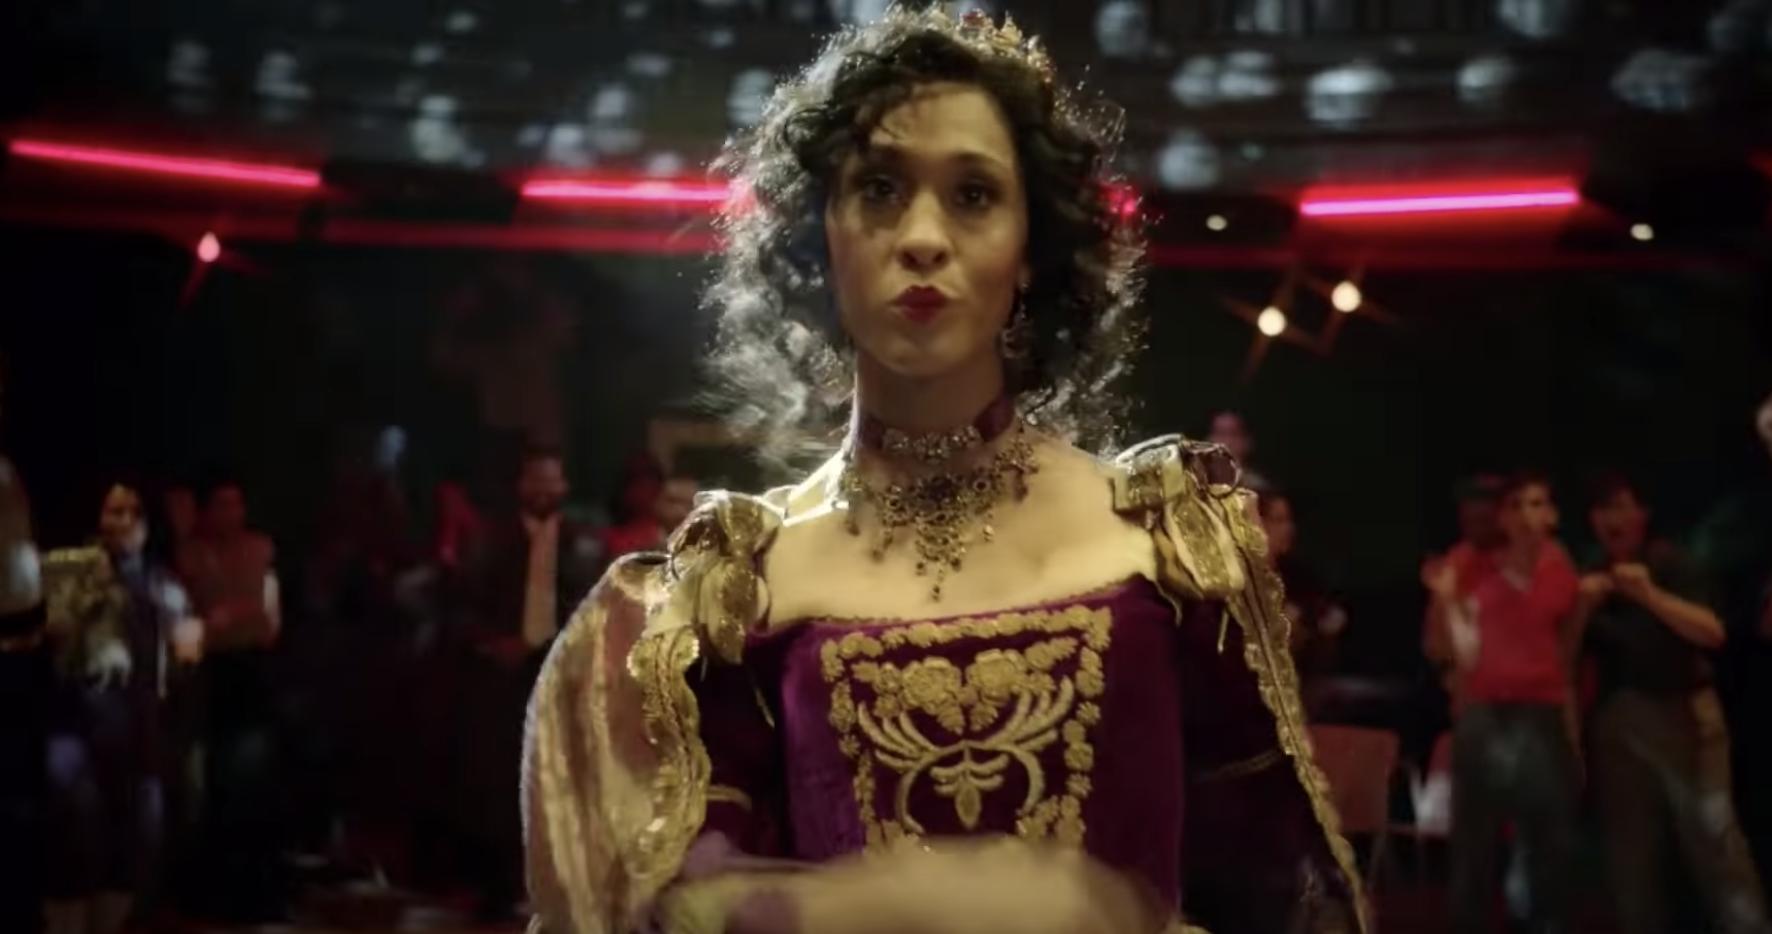 Mj Rodriguez as Blanca on Pose